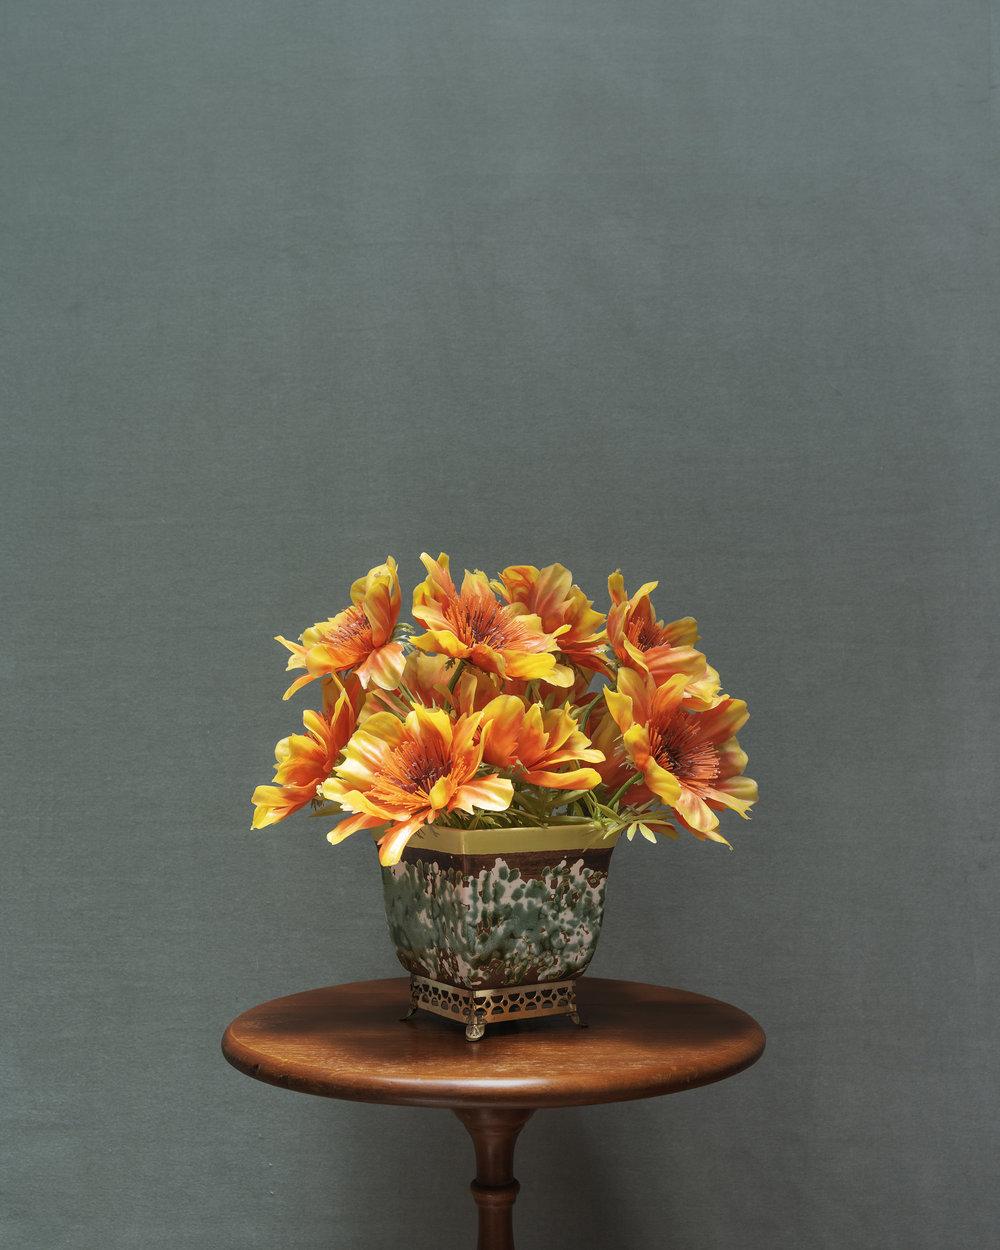 Modeled Vase